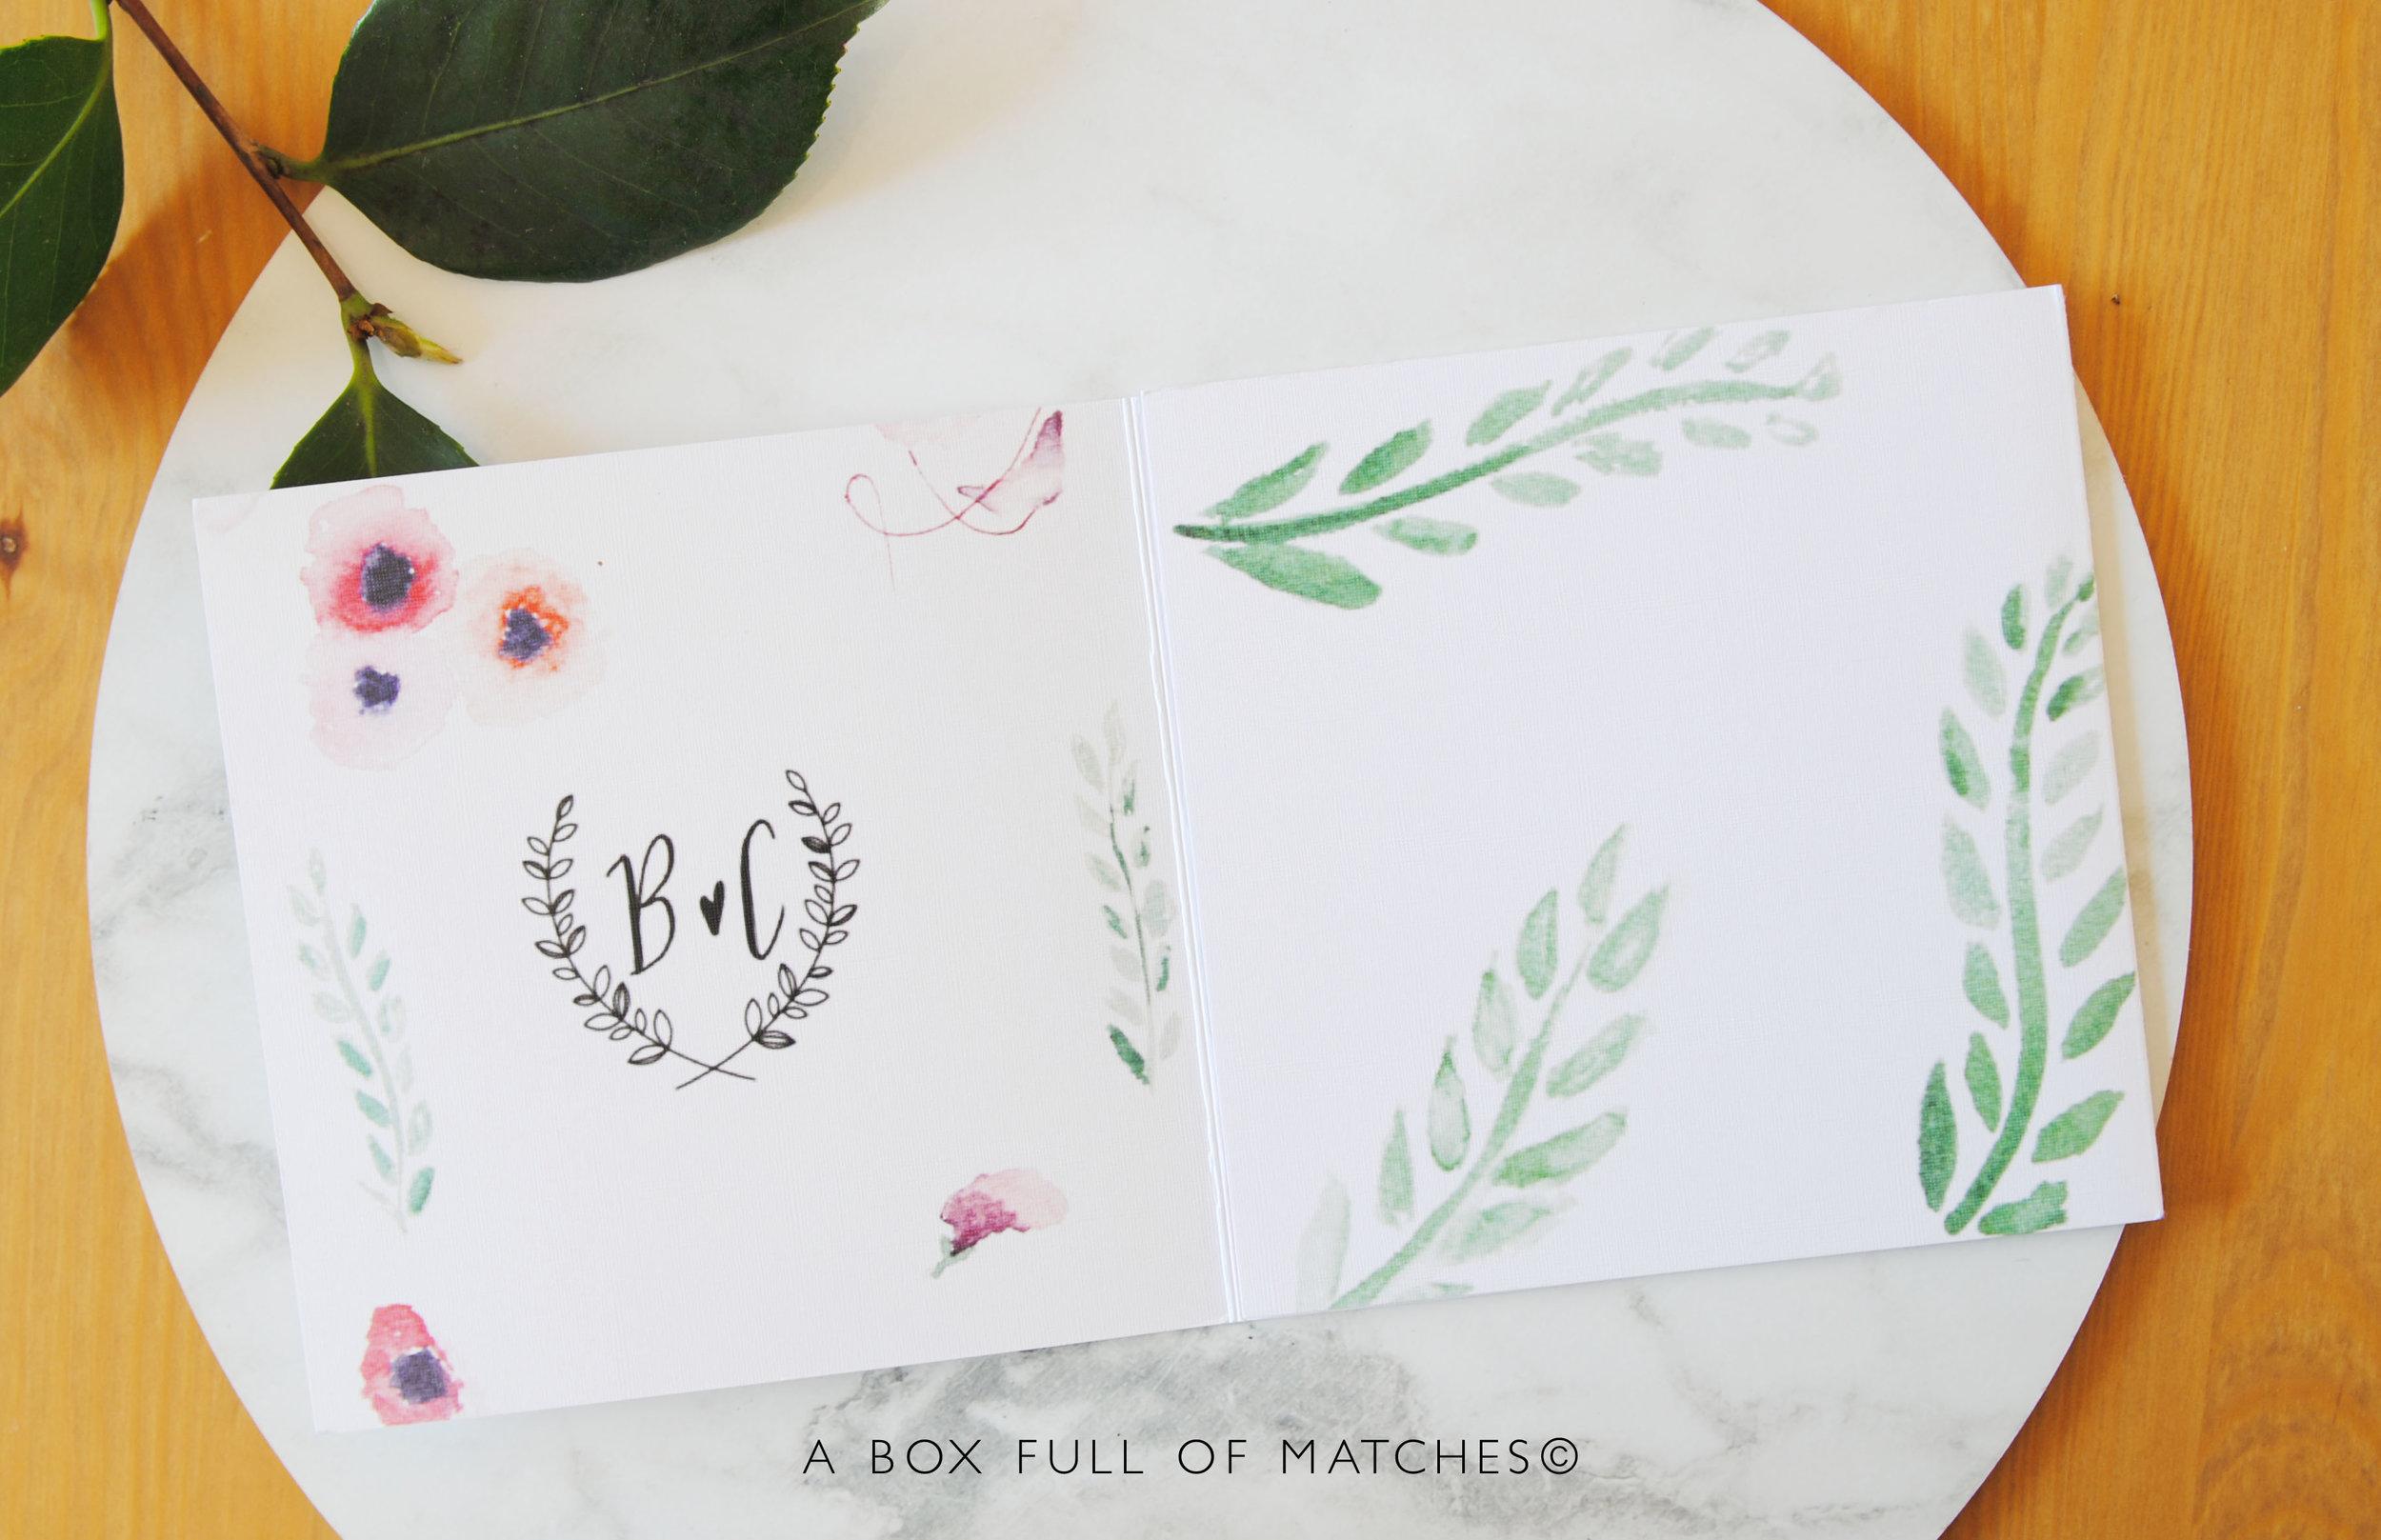 WEDDING-INVITATION-VINE-01.jpg